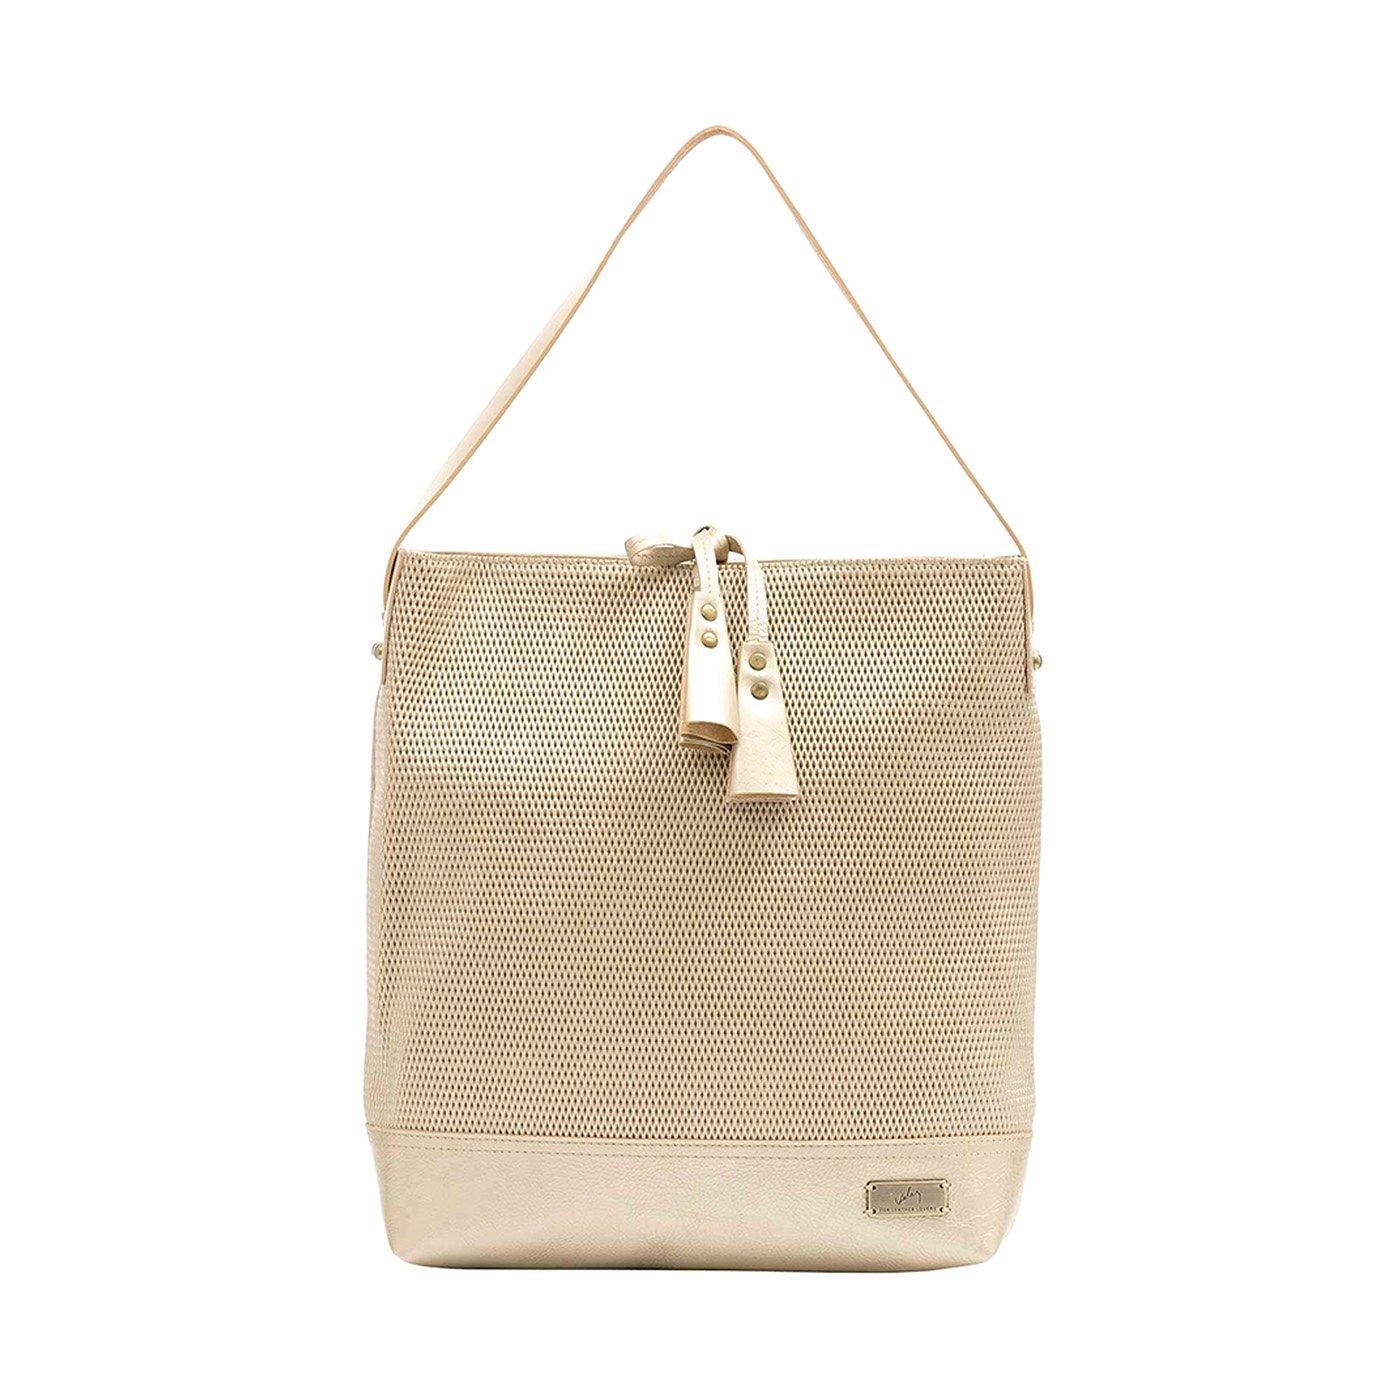 Velez mujer bolsas de piel para damas tote leather tote handbags for women  cueros velez jpg 8c9dc20c5adb1